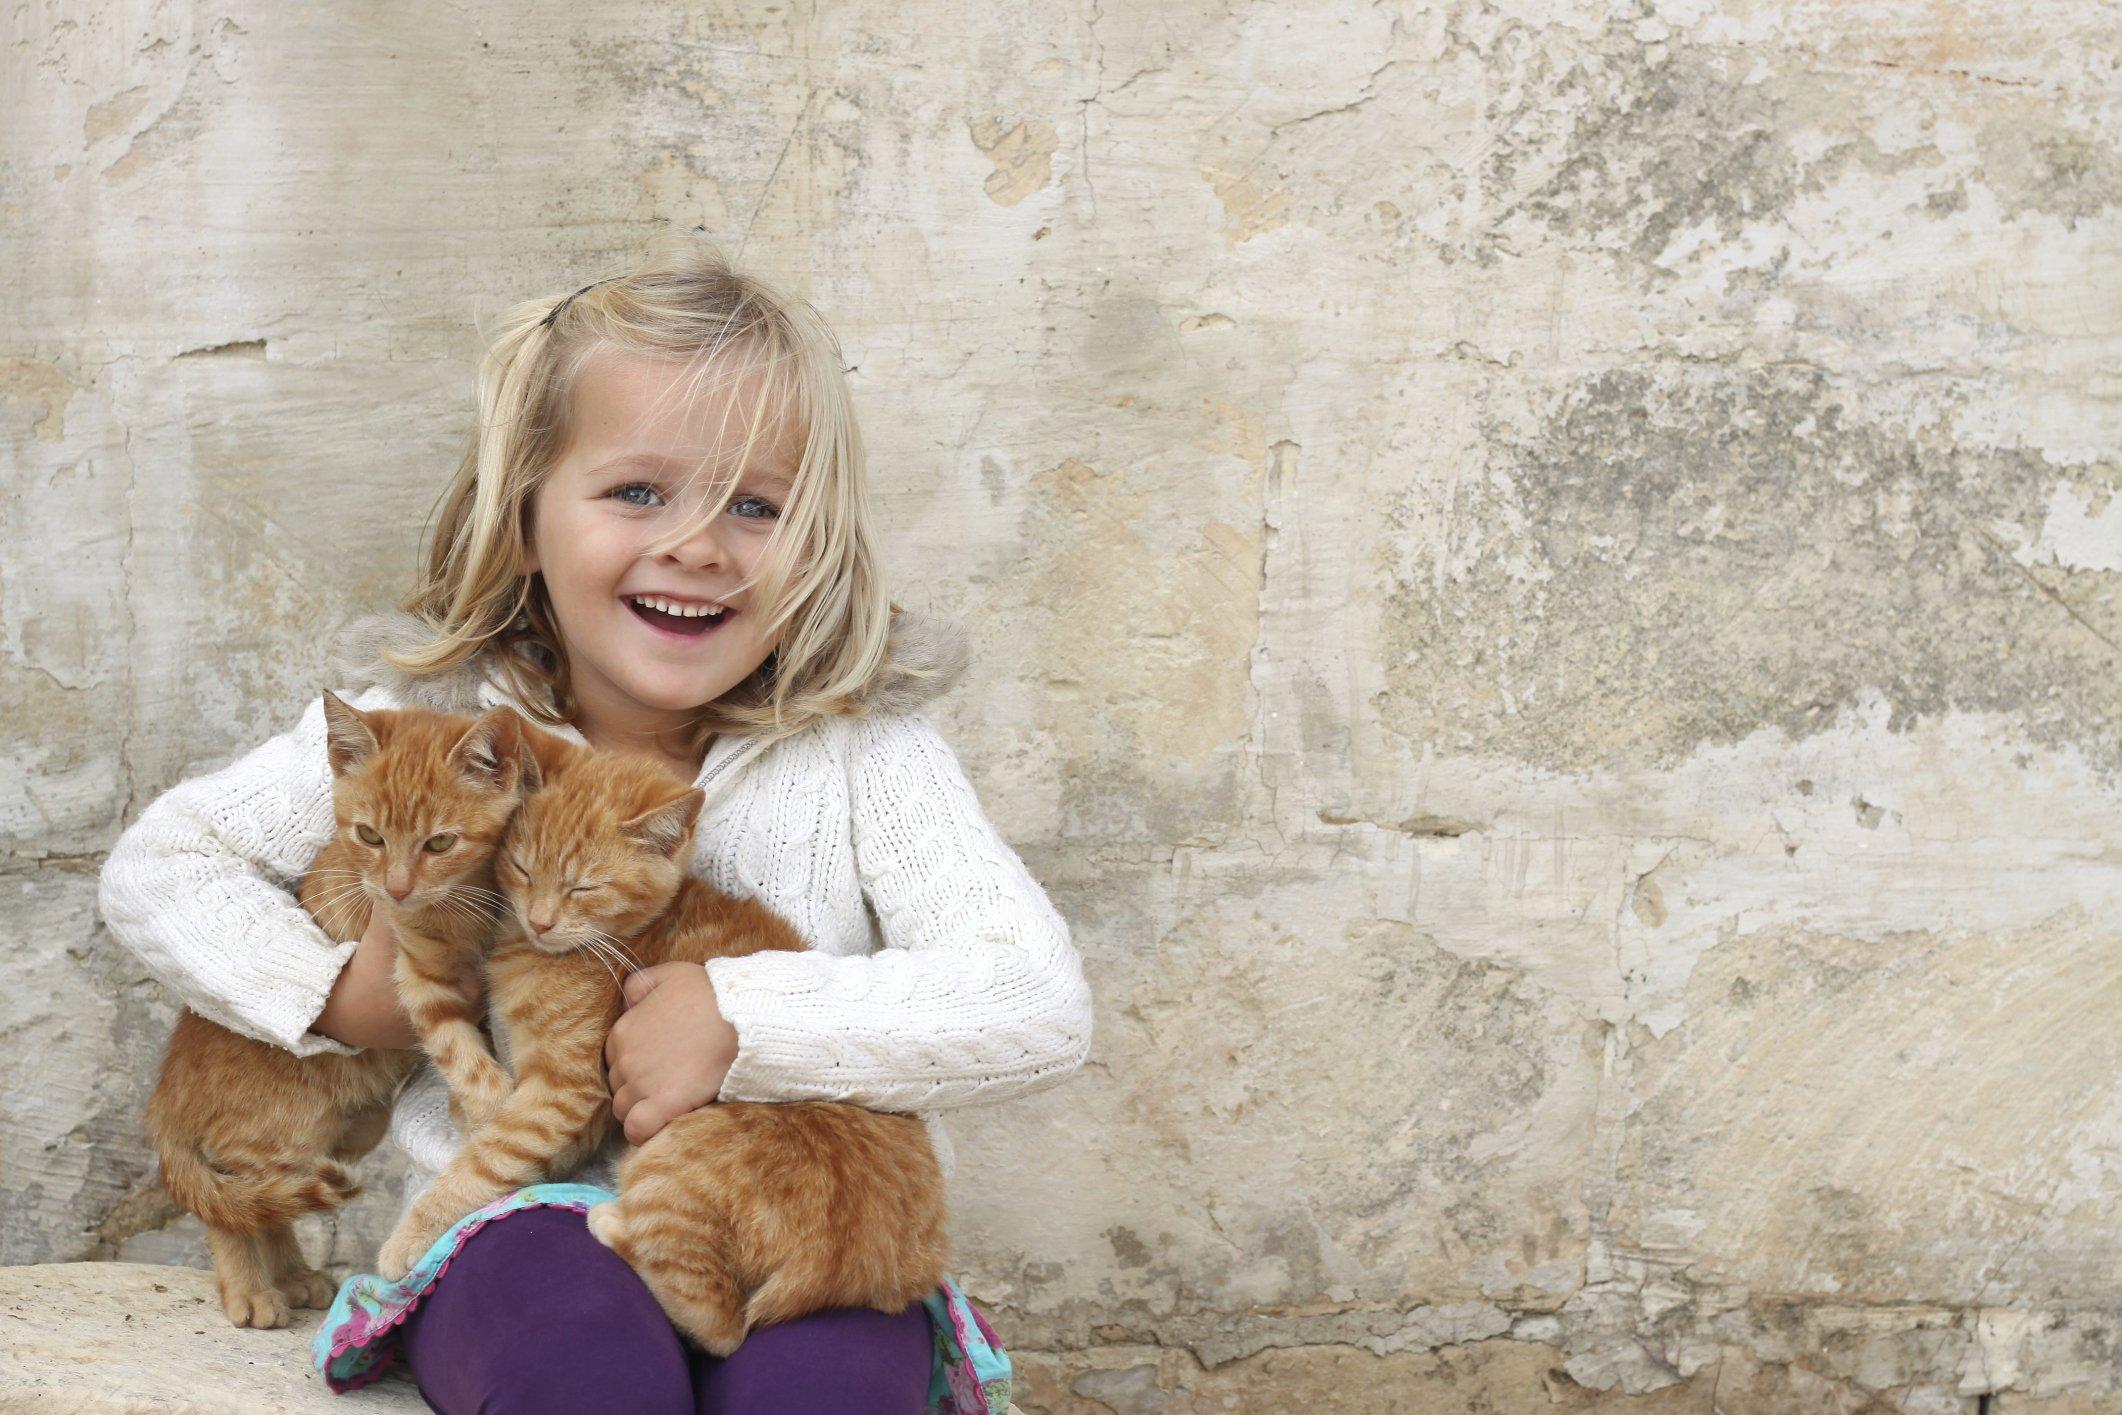 little girl with kittens